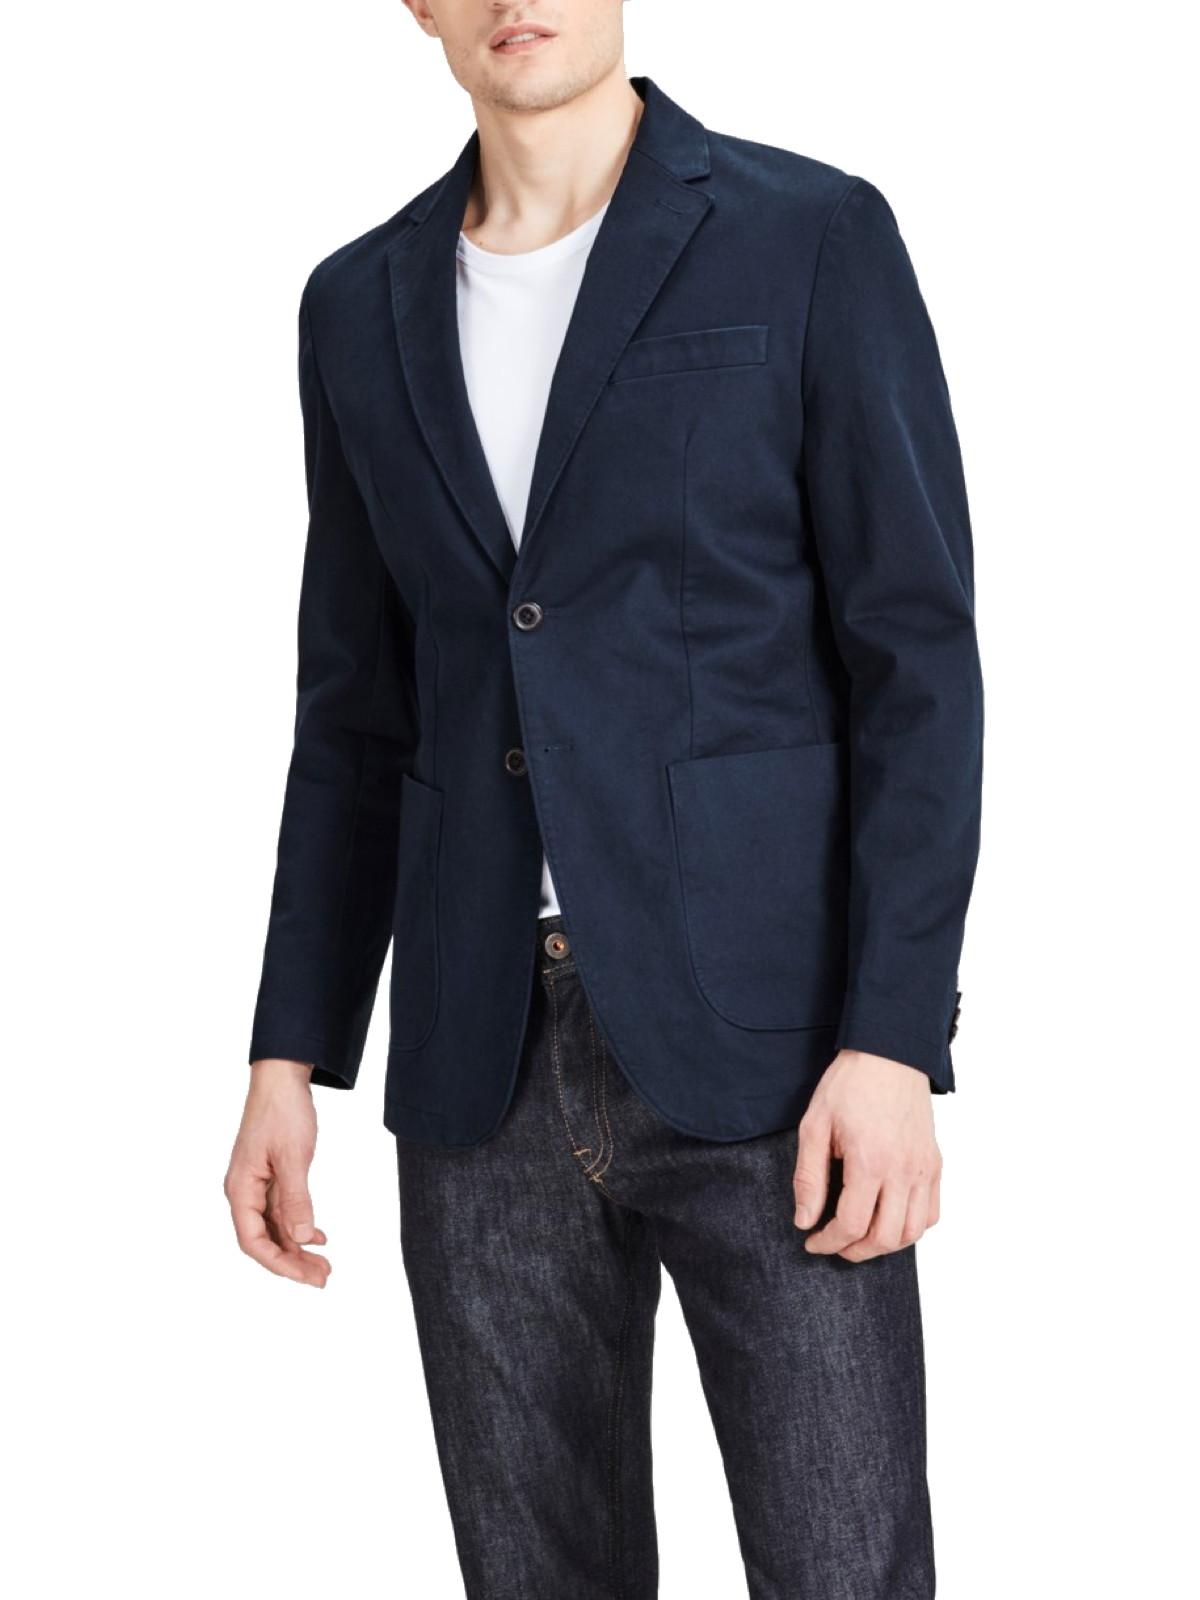 jack jones herren sakko anzug jacke jprmanuel blazer. Black Bedroom Furniture Sets. Home Design Ideas